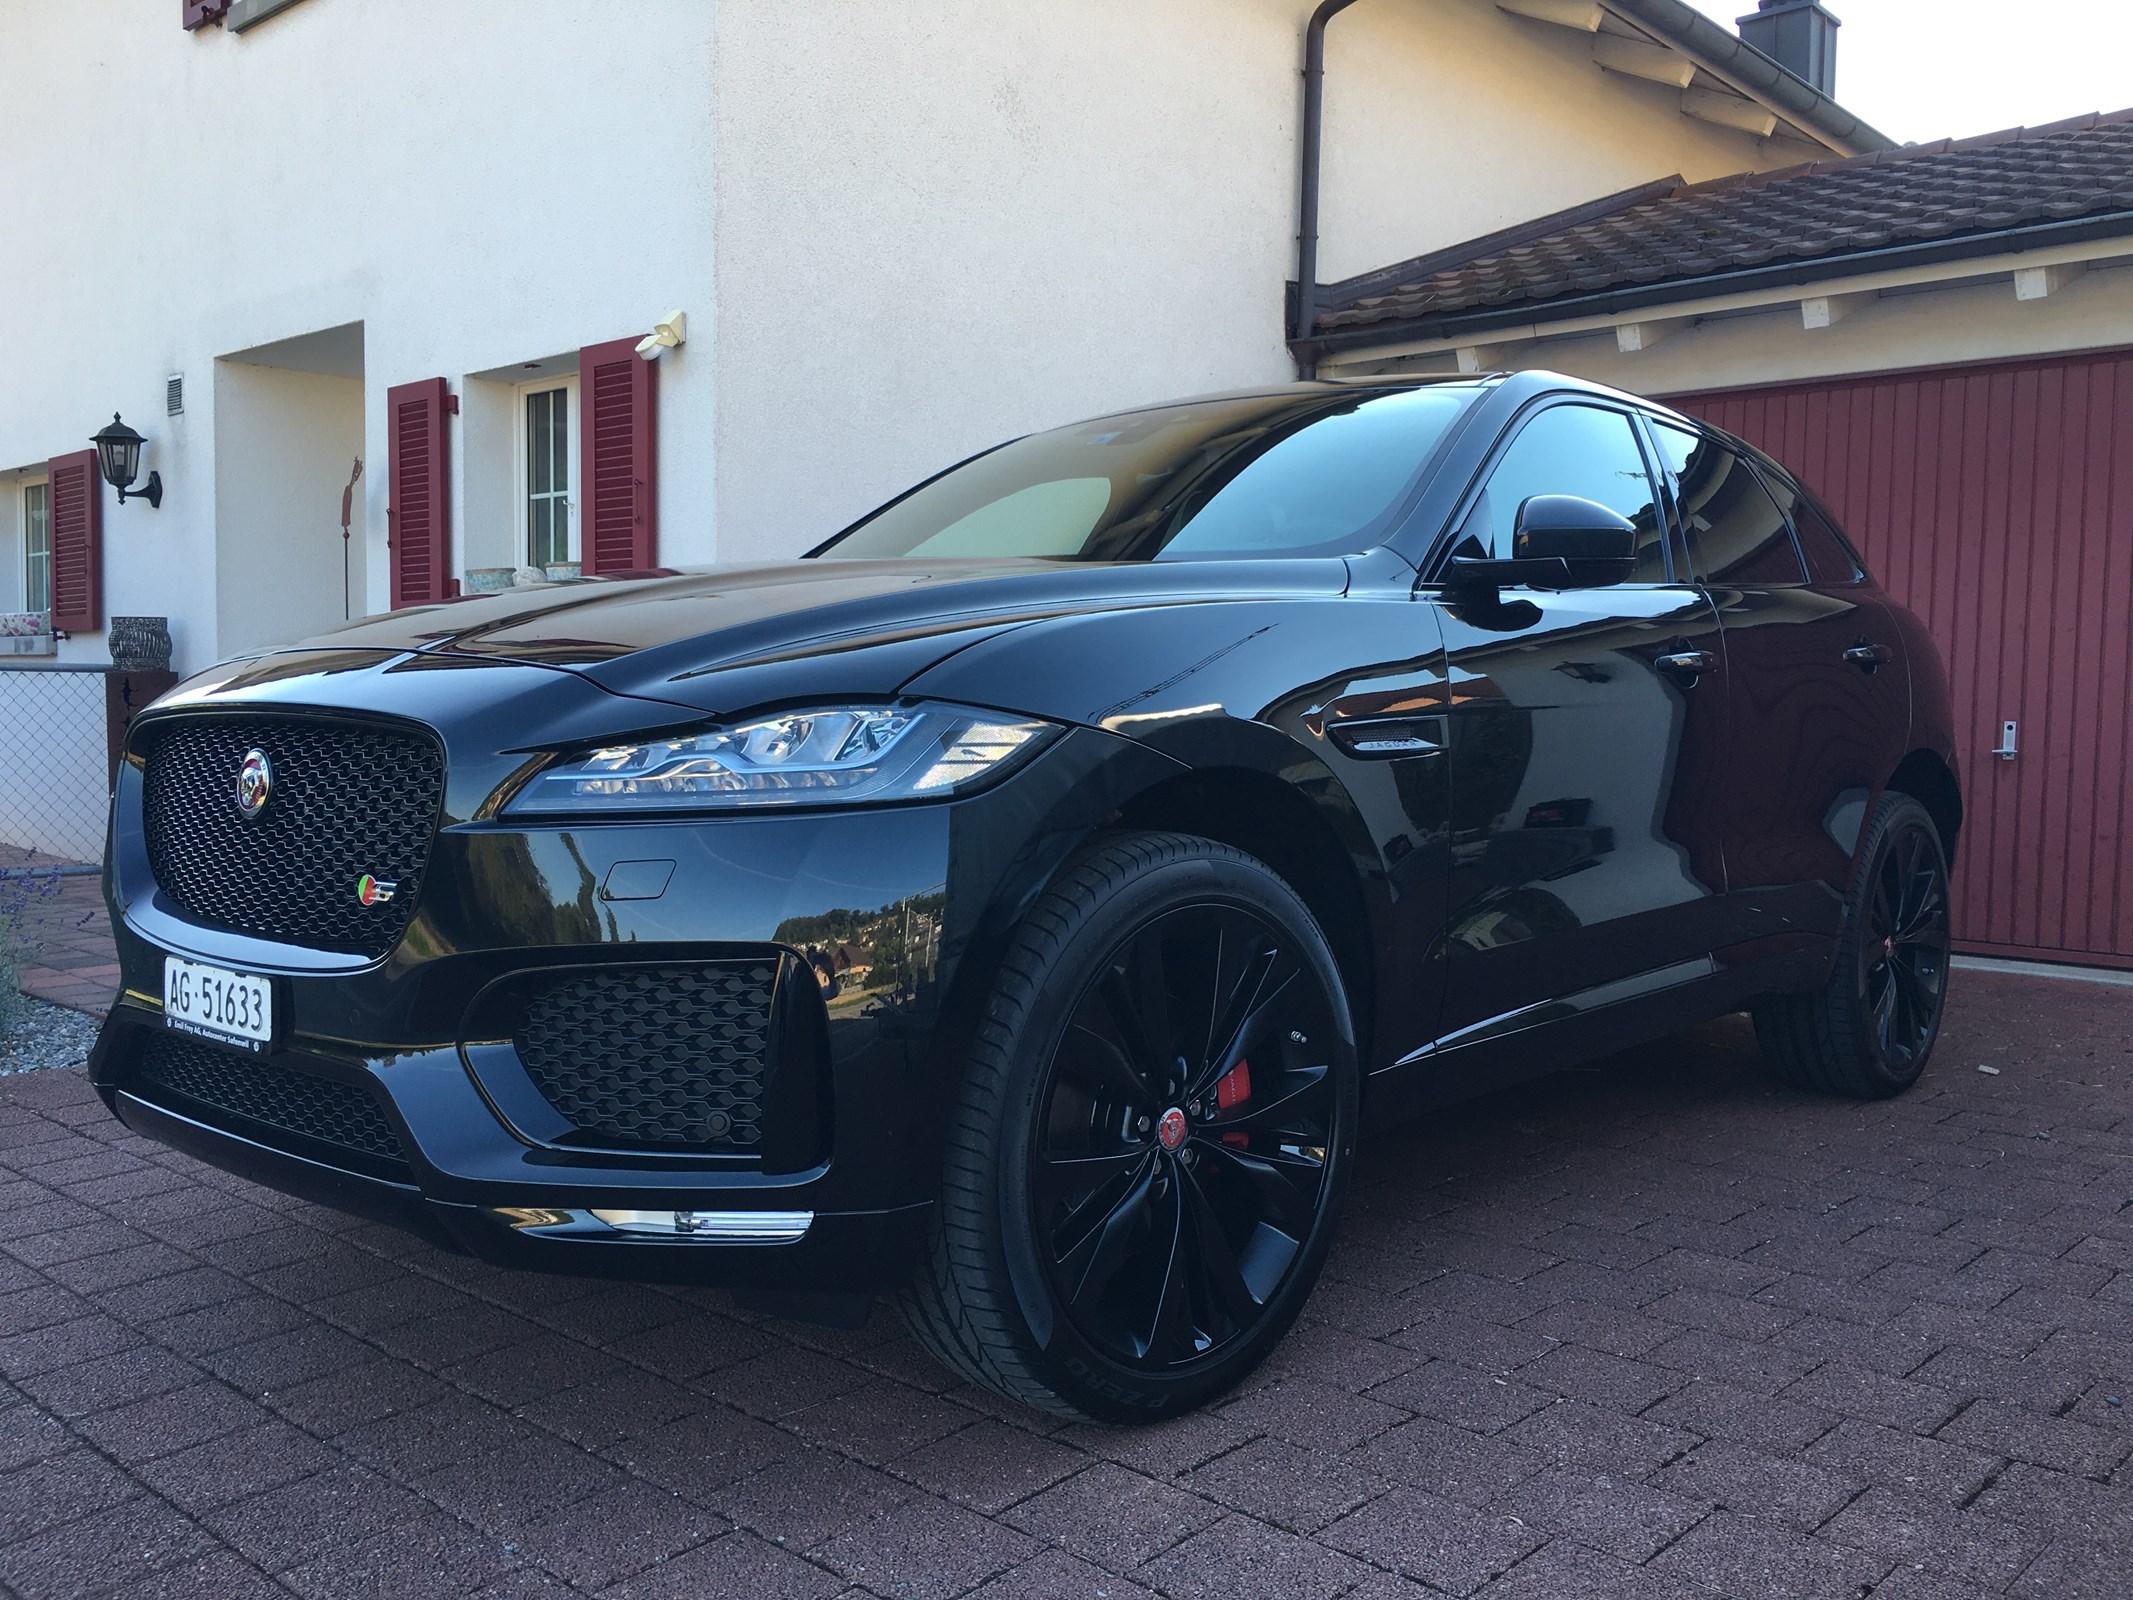 Jaguar F-Pace 3.0 V6 S/C S AWD